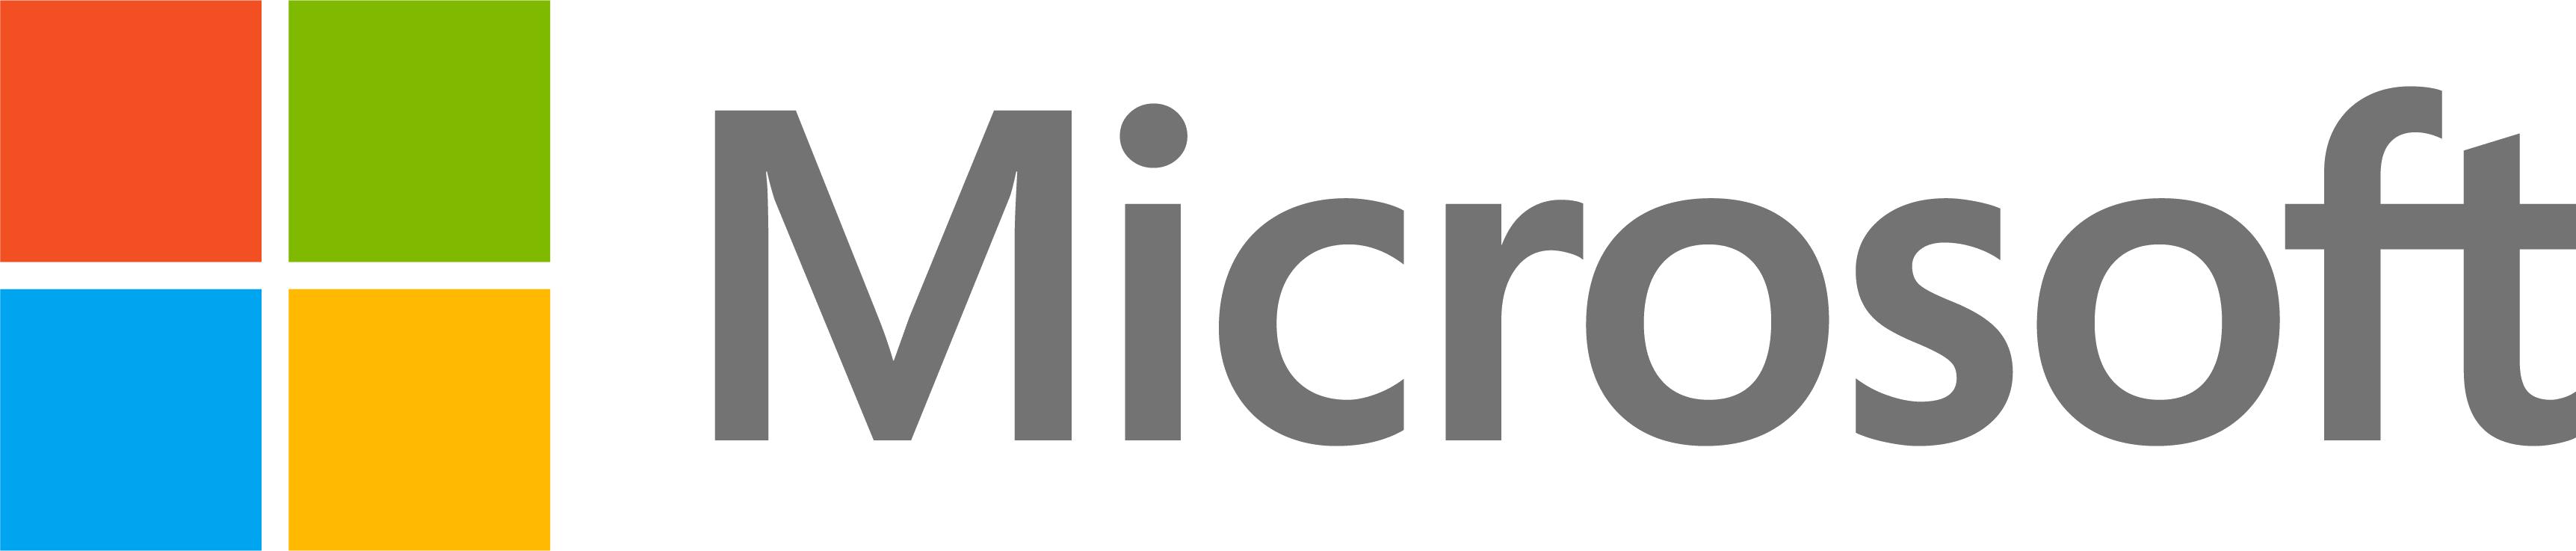 Image result for microsoft logo png